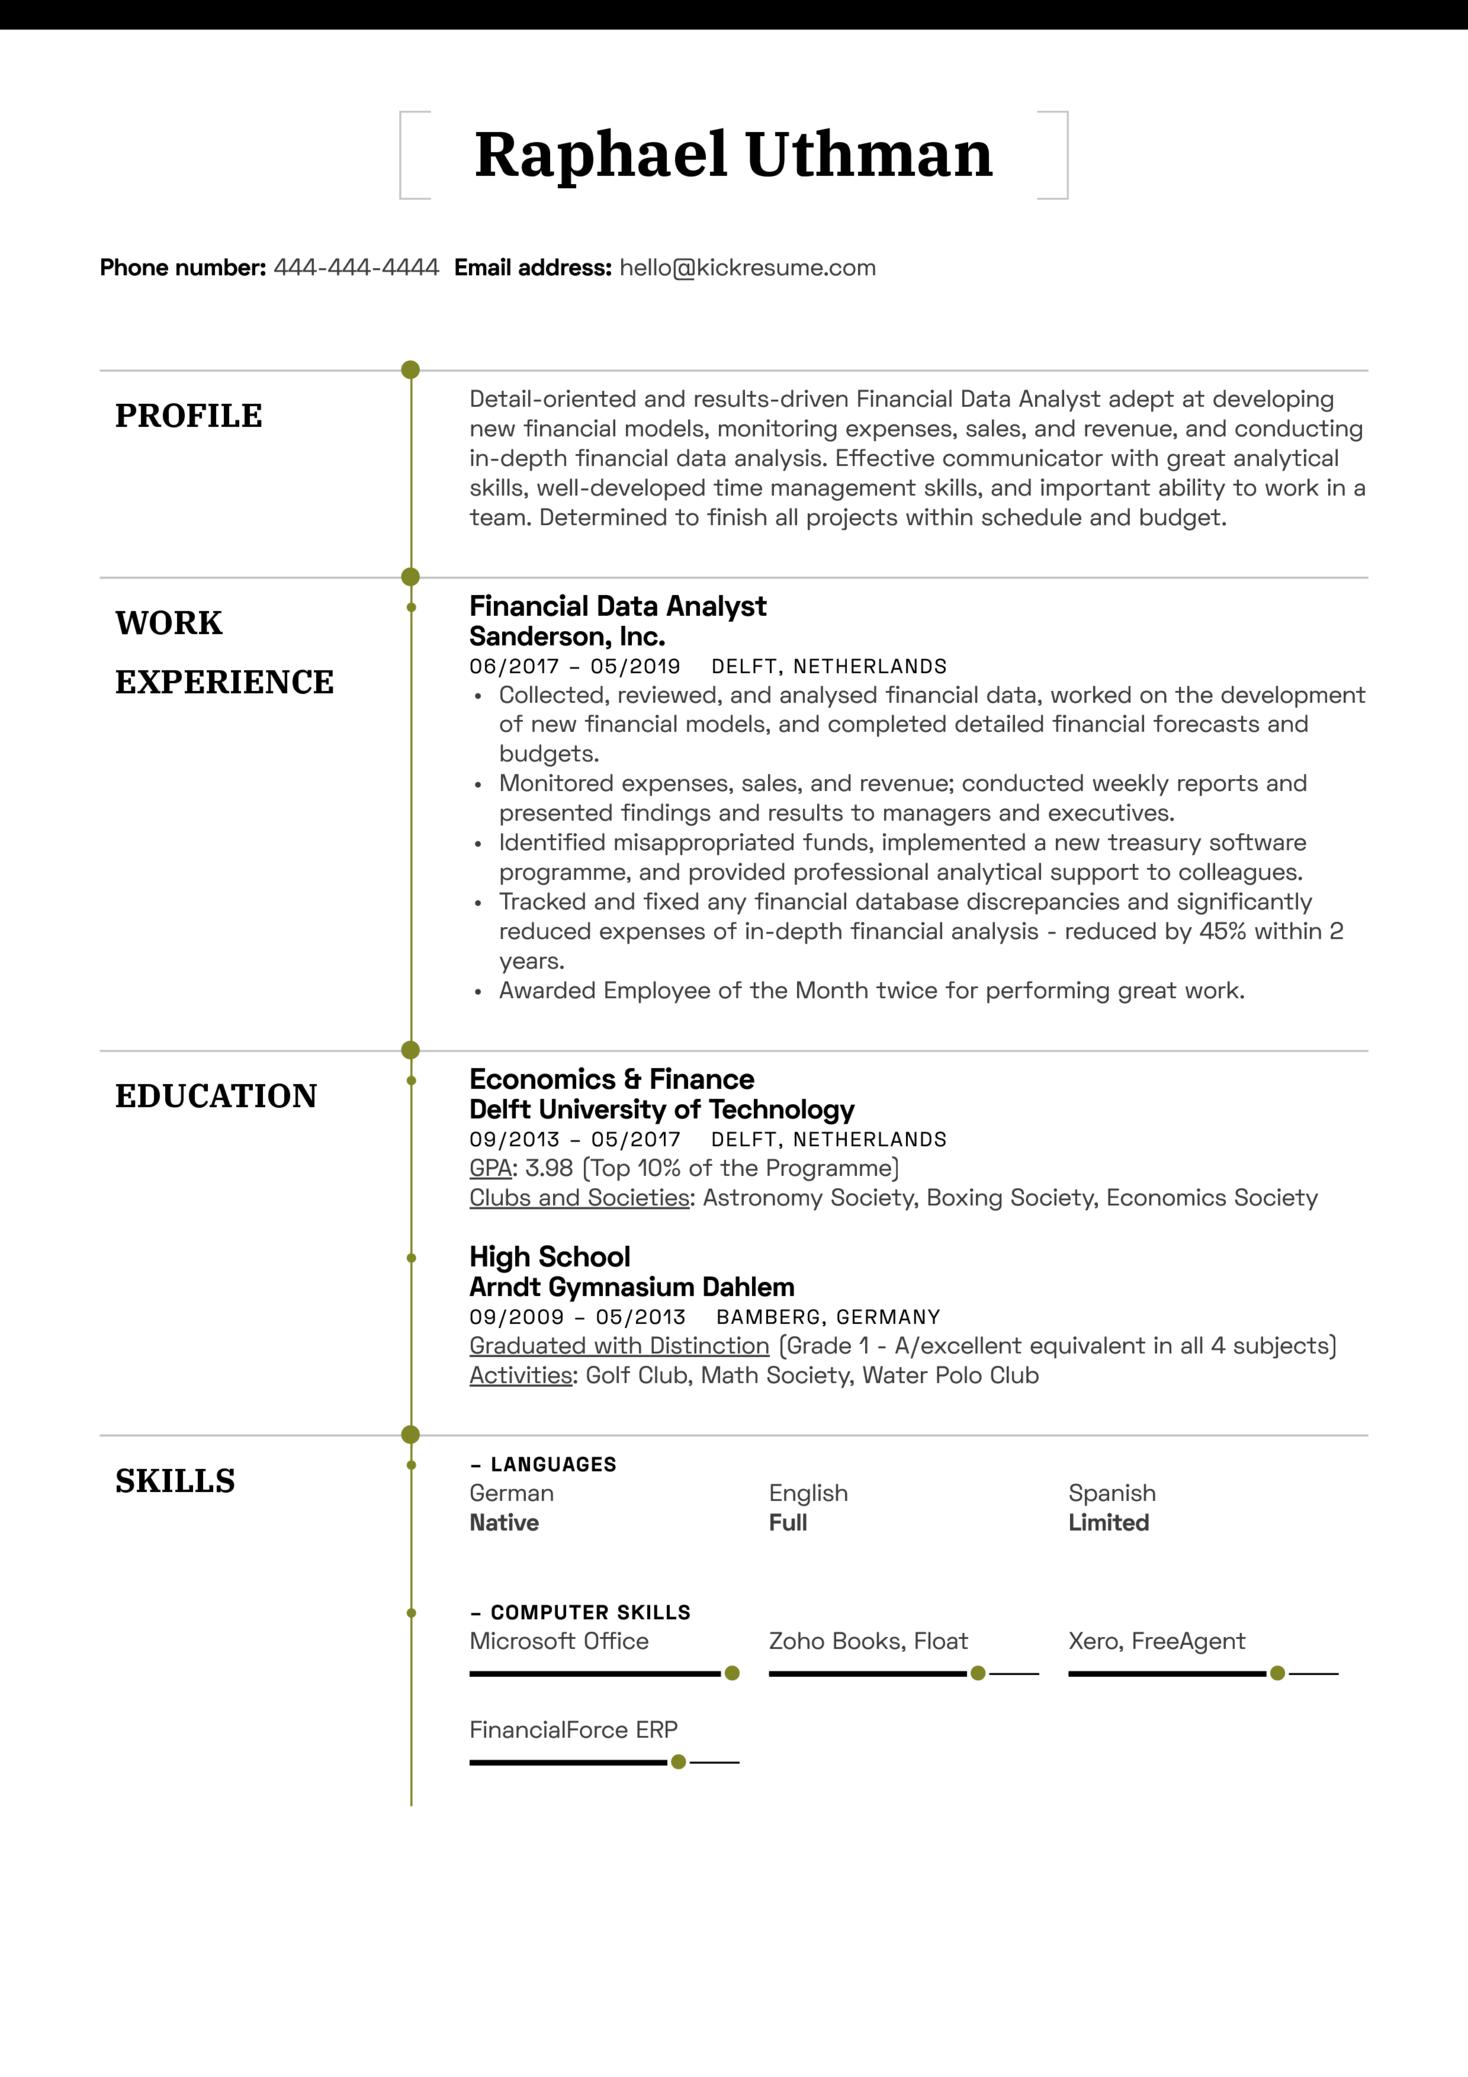 Financial Data Analyst Resume Sample (Parte 1)